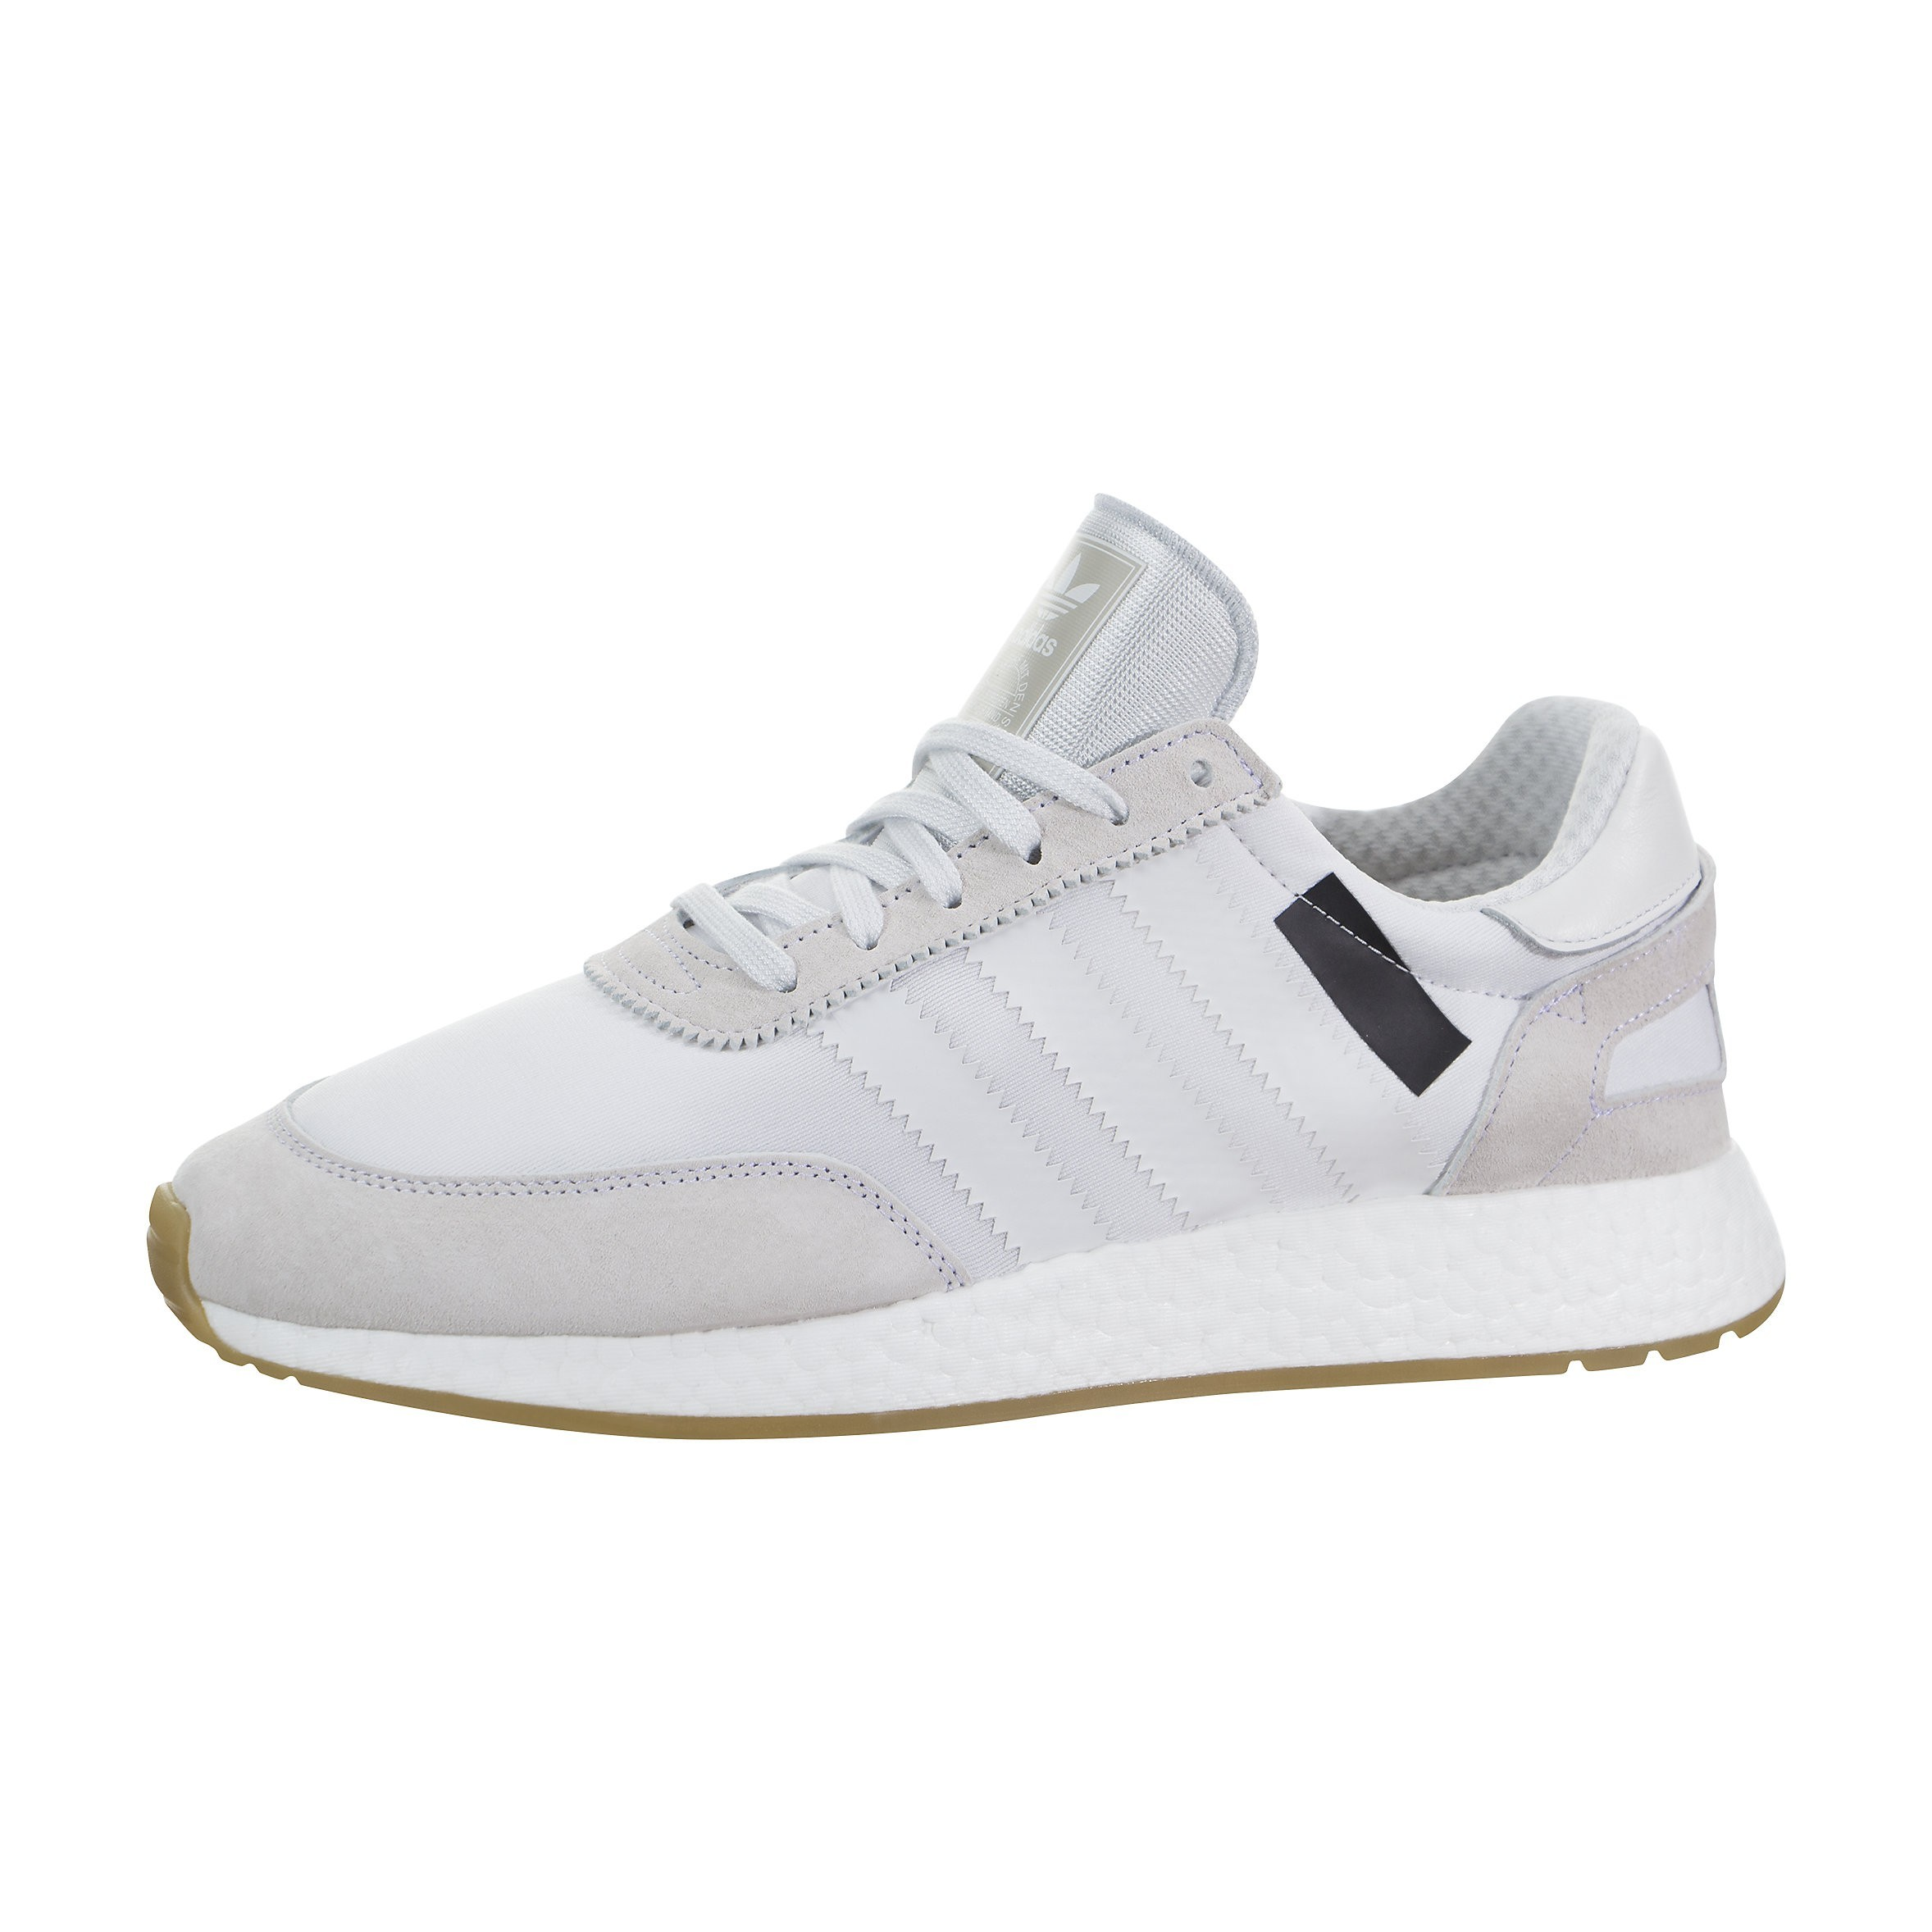 varios tipos de buen servicio descuento especial de Hombre Adidas Iniki Runner 'I-5923' B42224 Blancas/Blancas